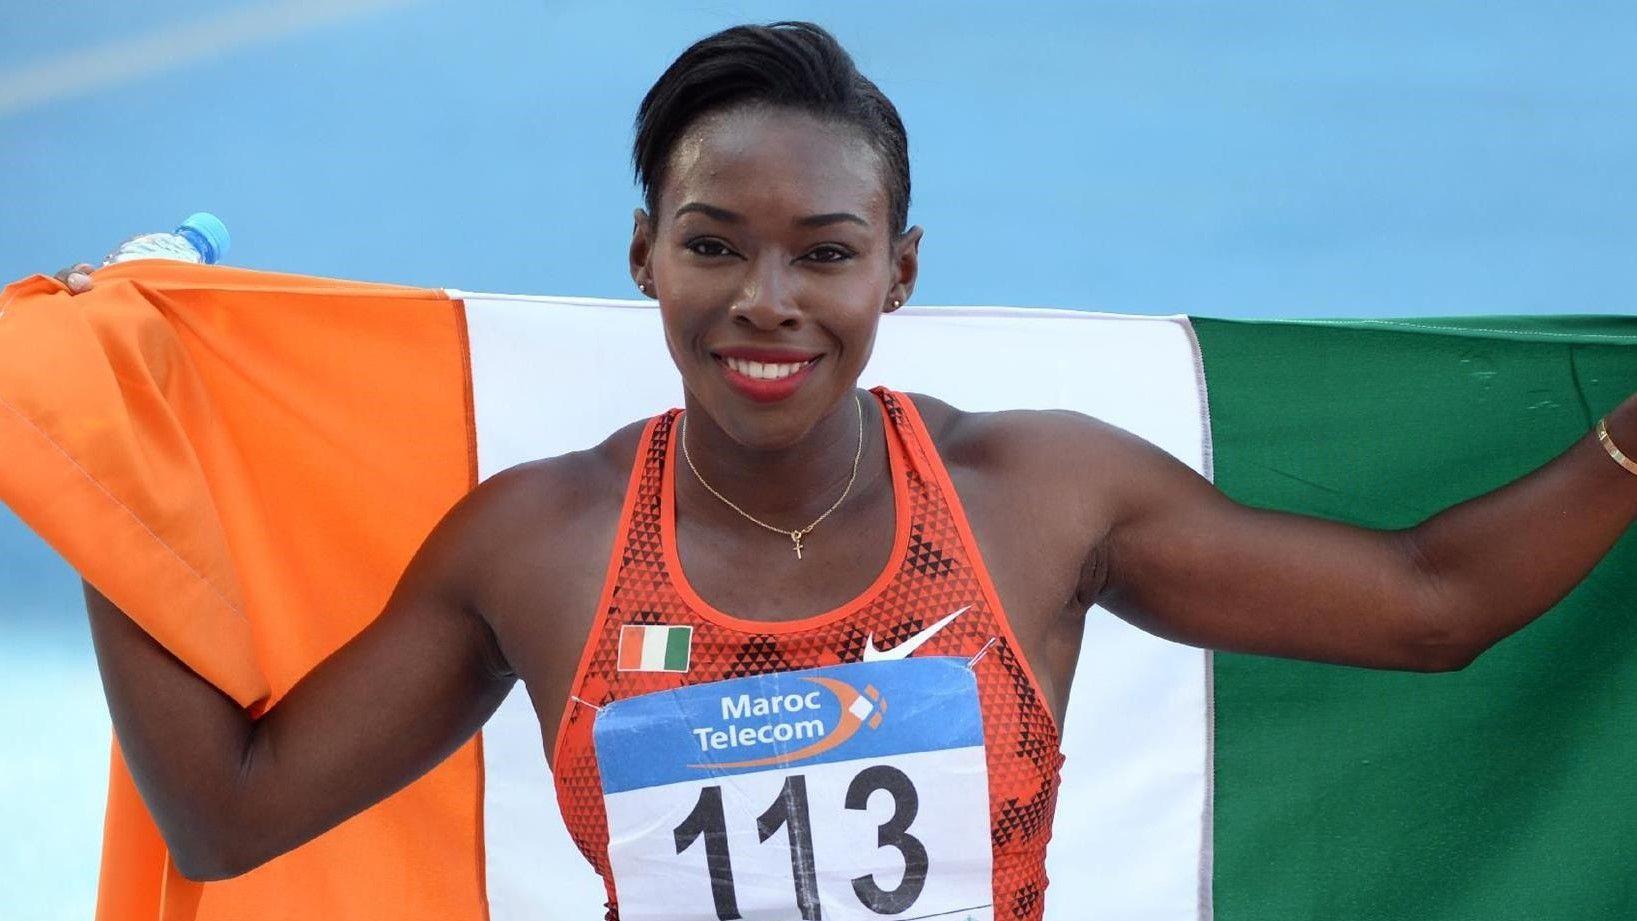 Ahoure Advances to Olympics 100m Semifinals